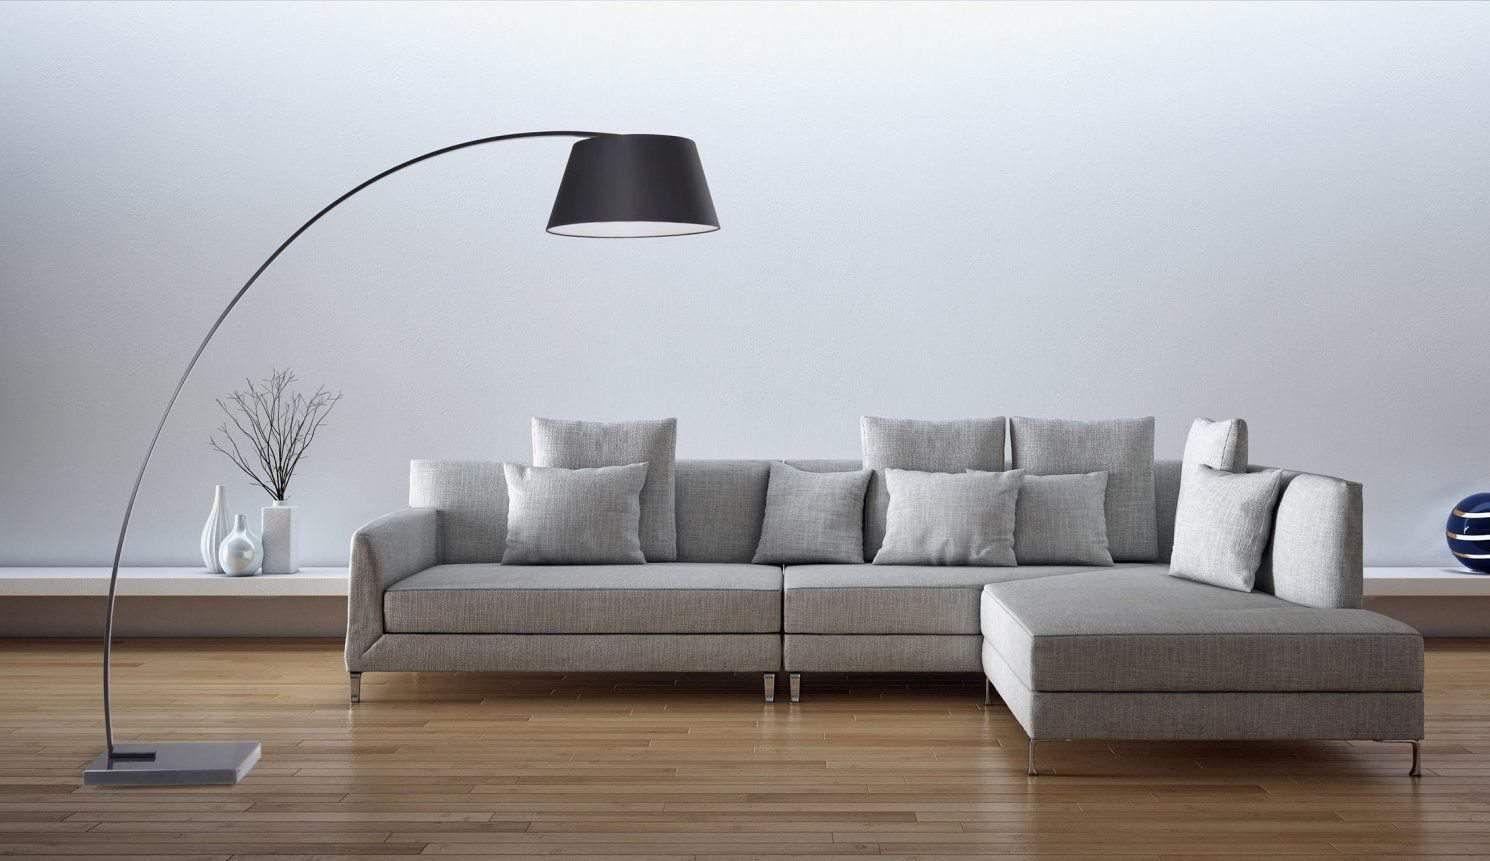 The Halogen Floor Lamp Can Be Excellent